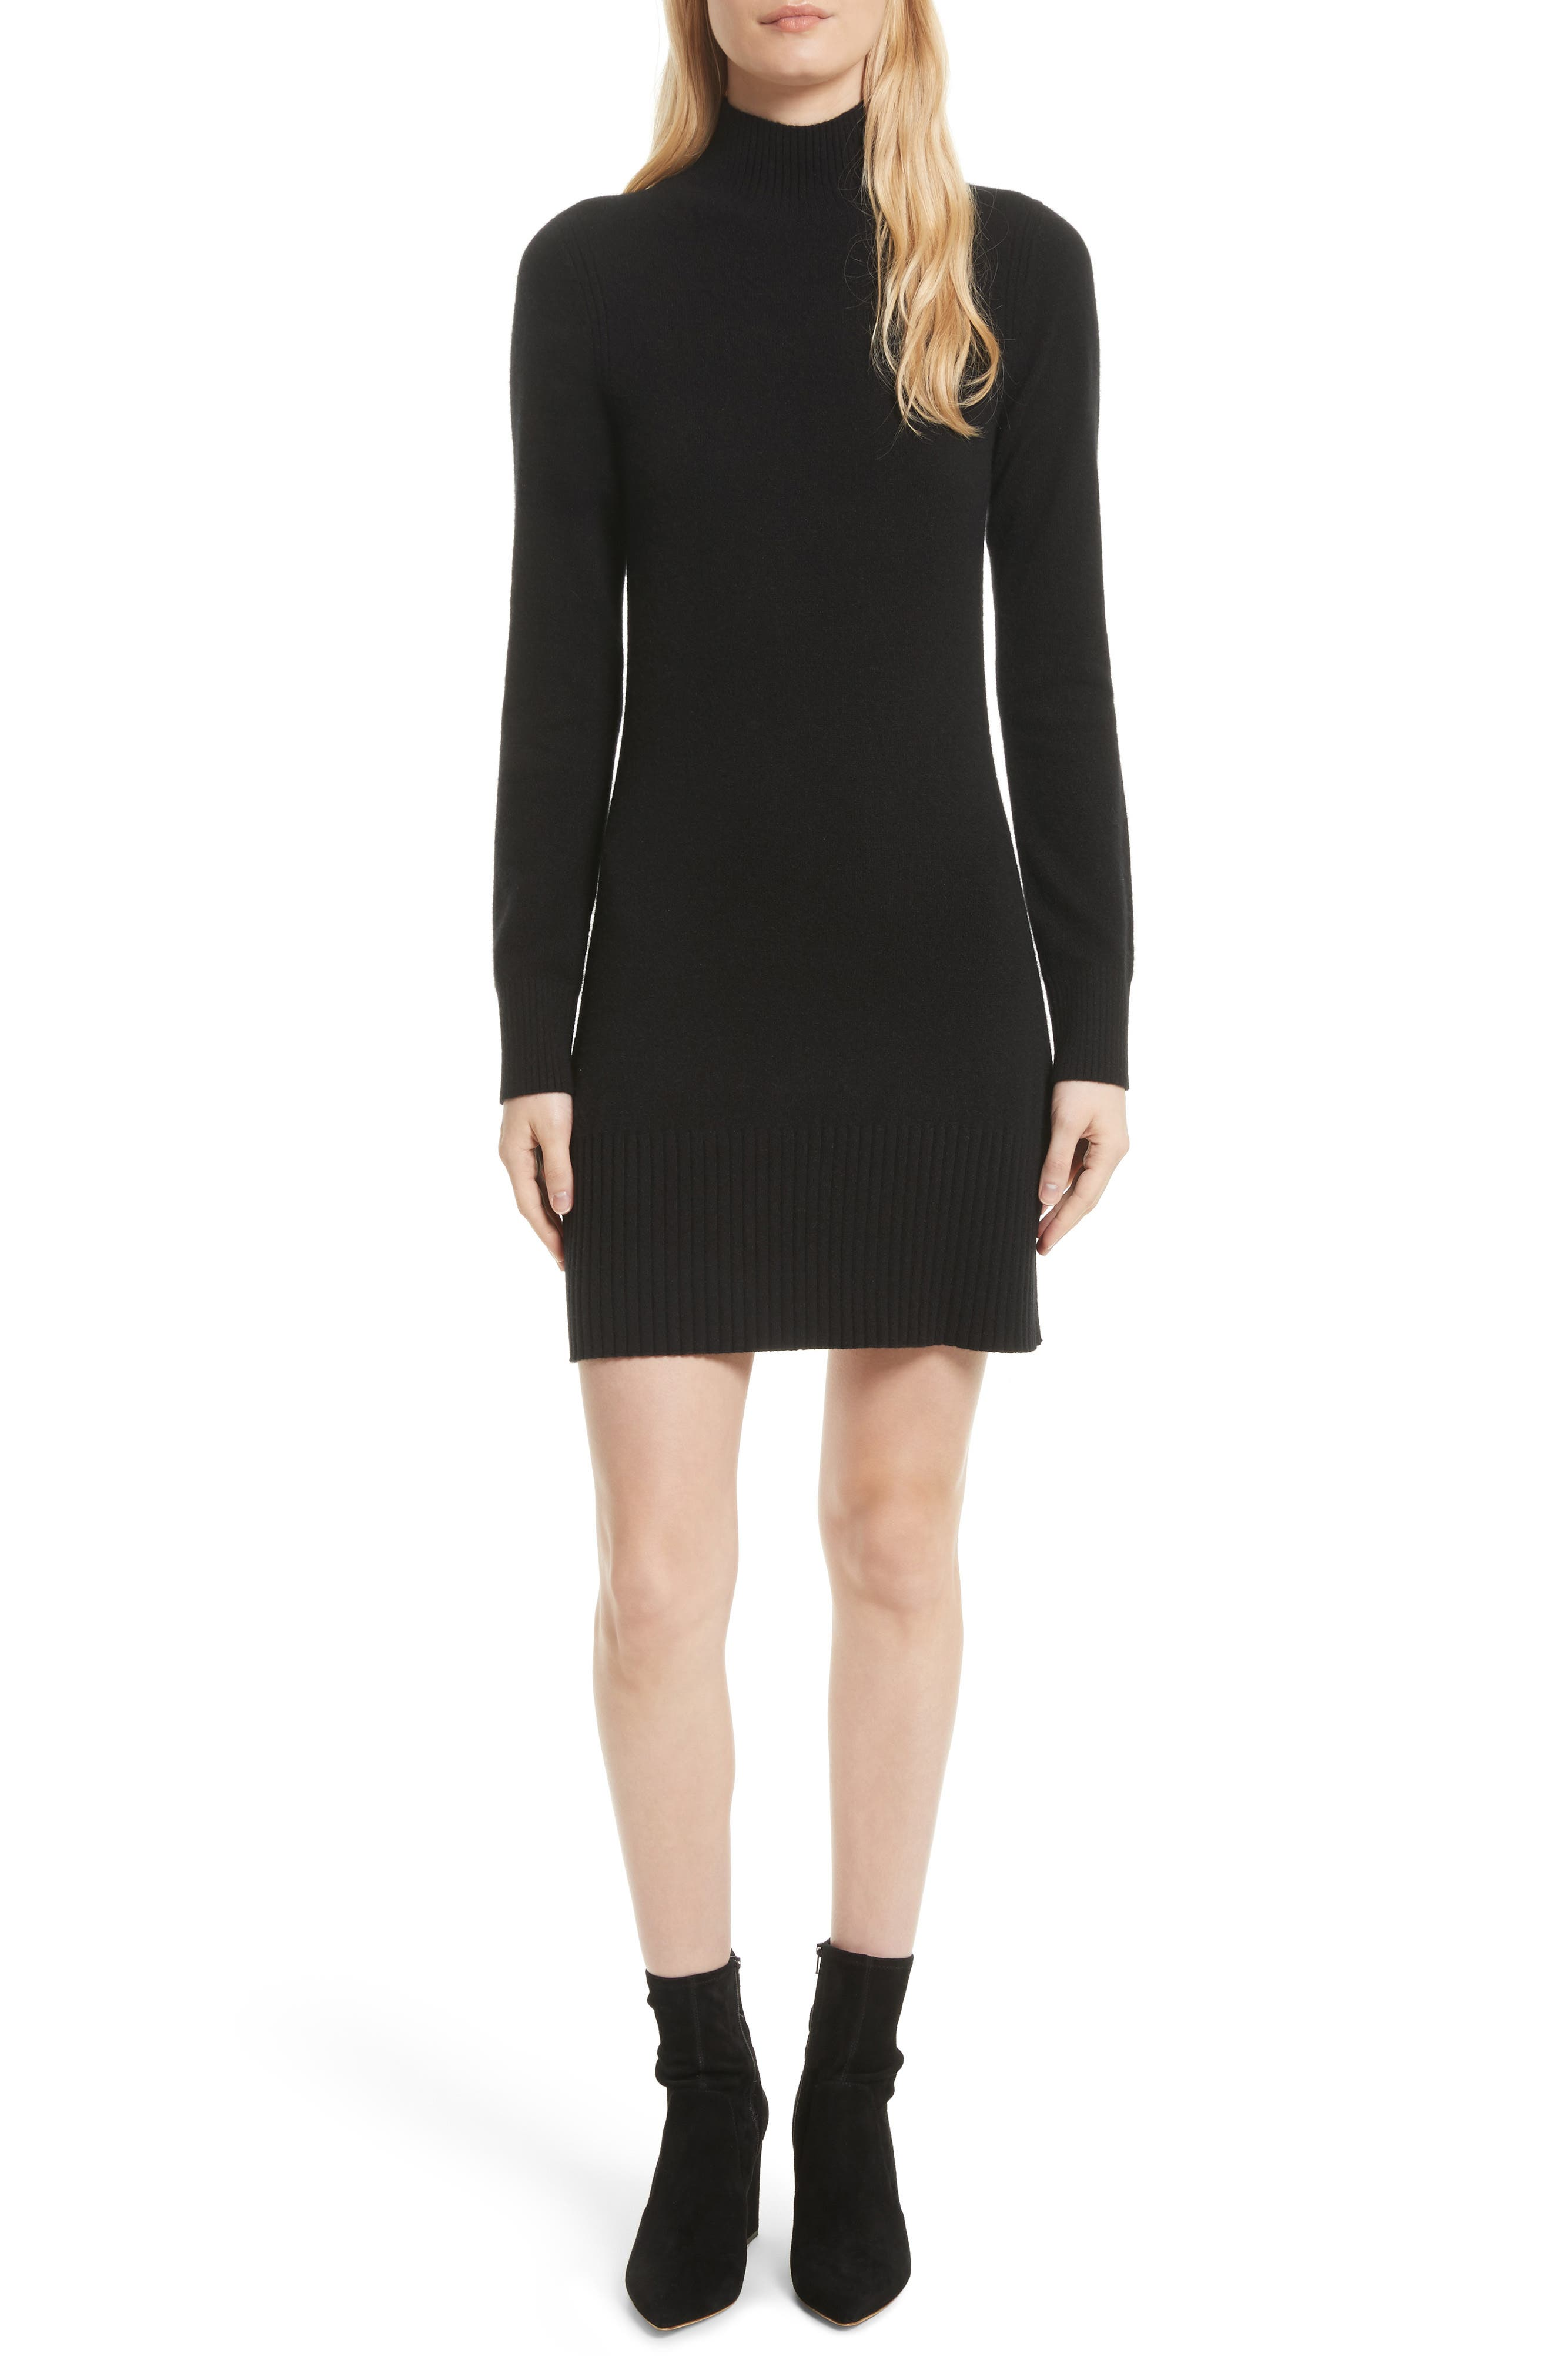 Main Image - FRAME Turtleneck Cashmere Sweater Dress